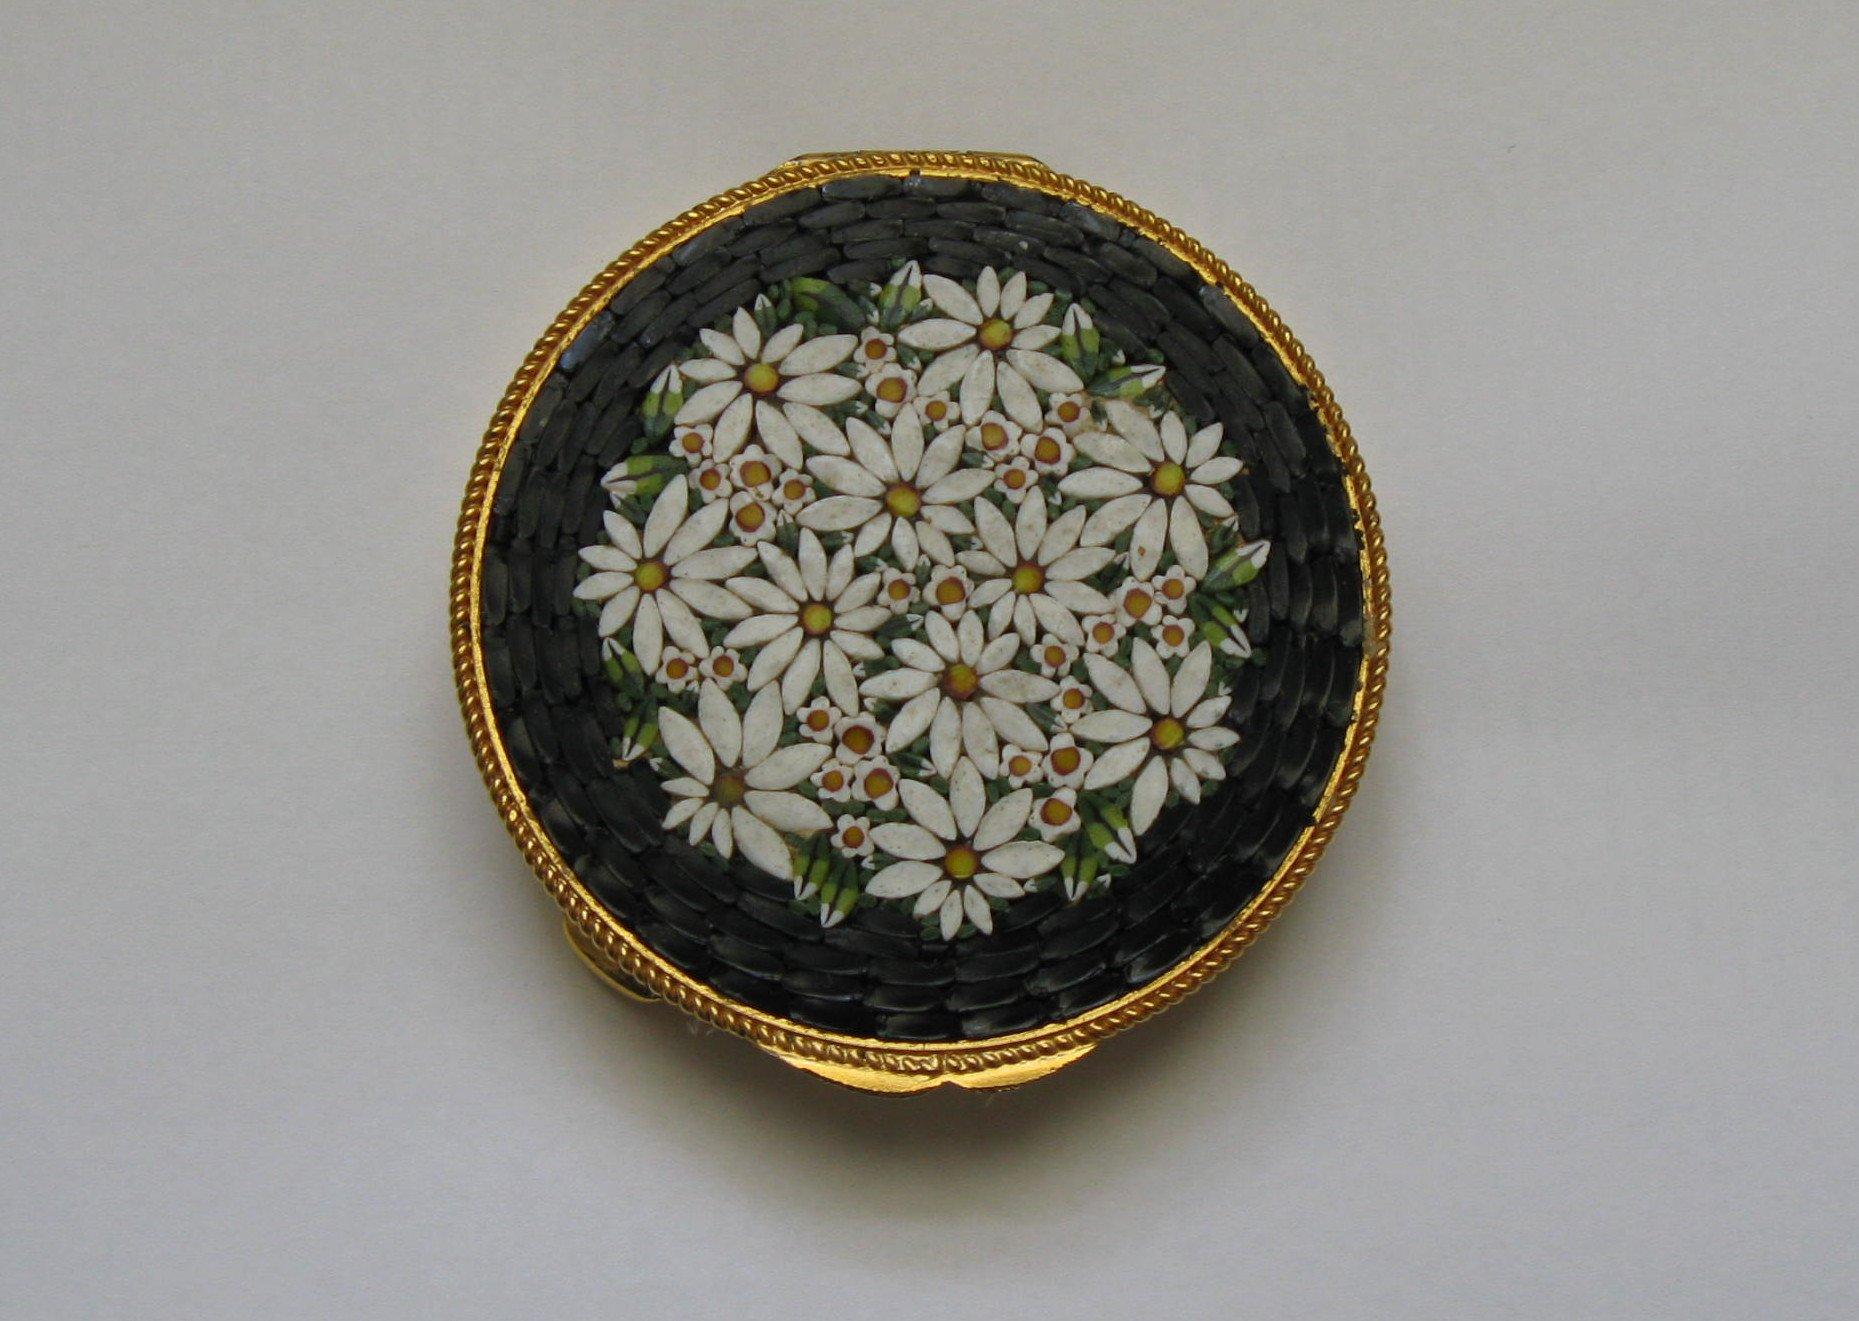 Micro mosaic flower compact